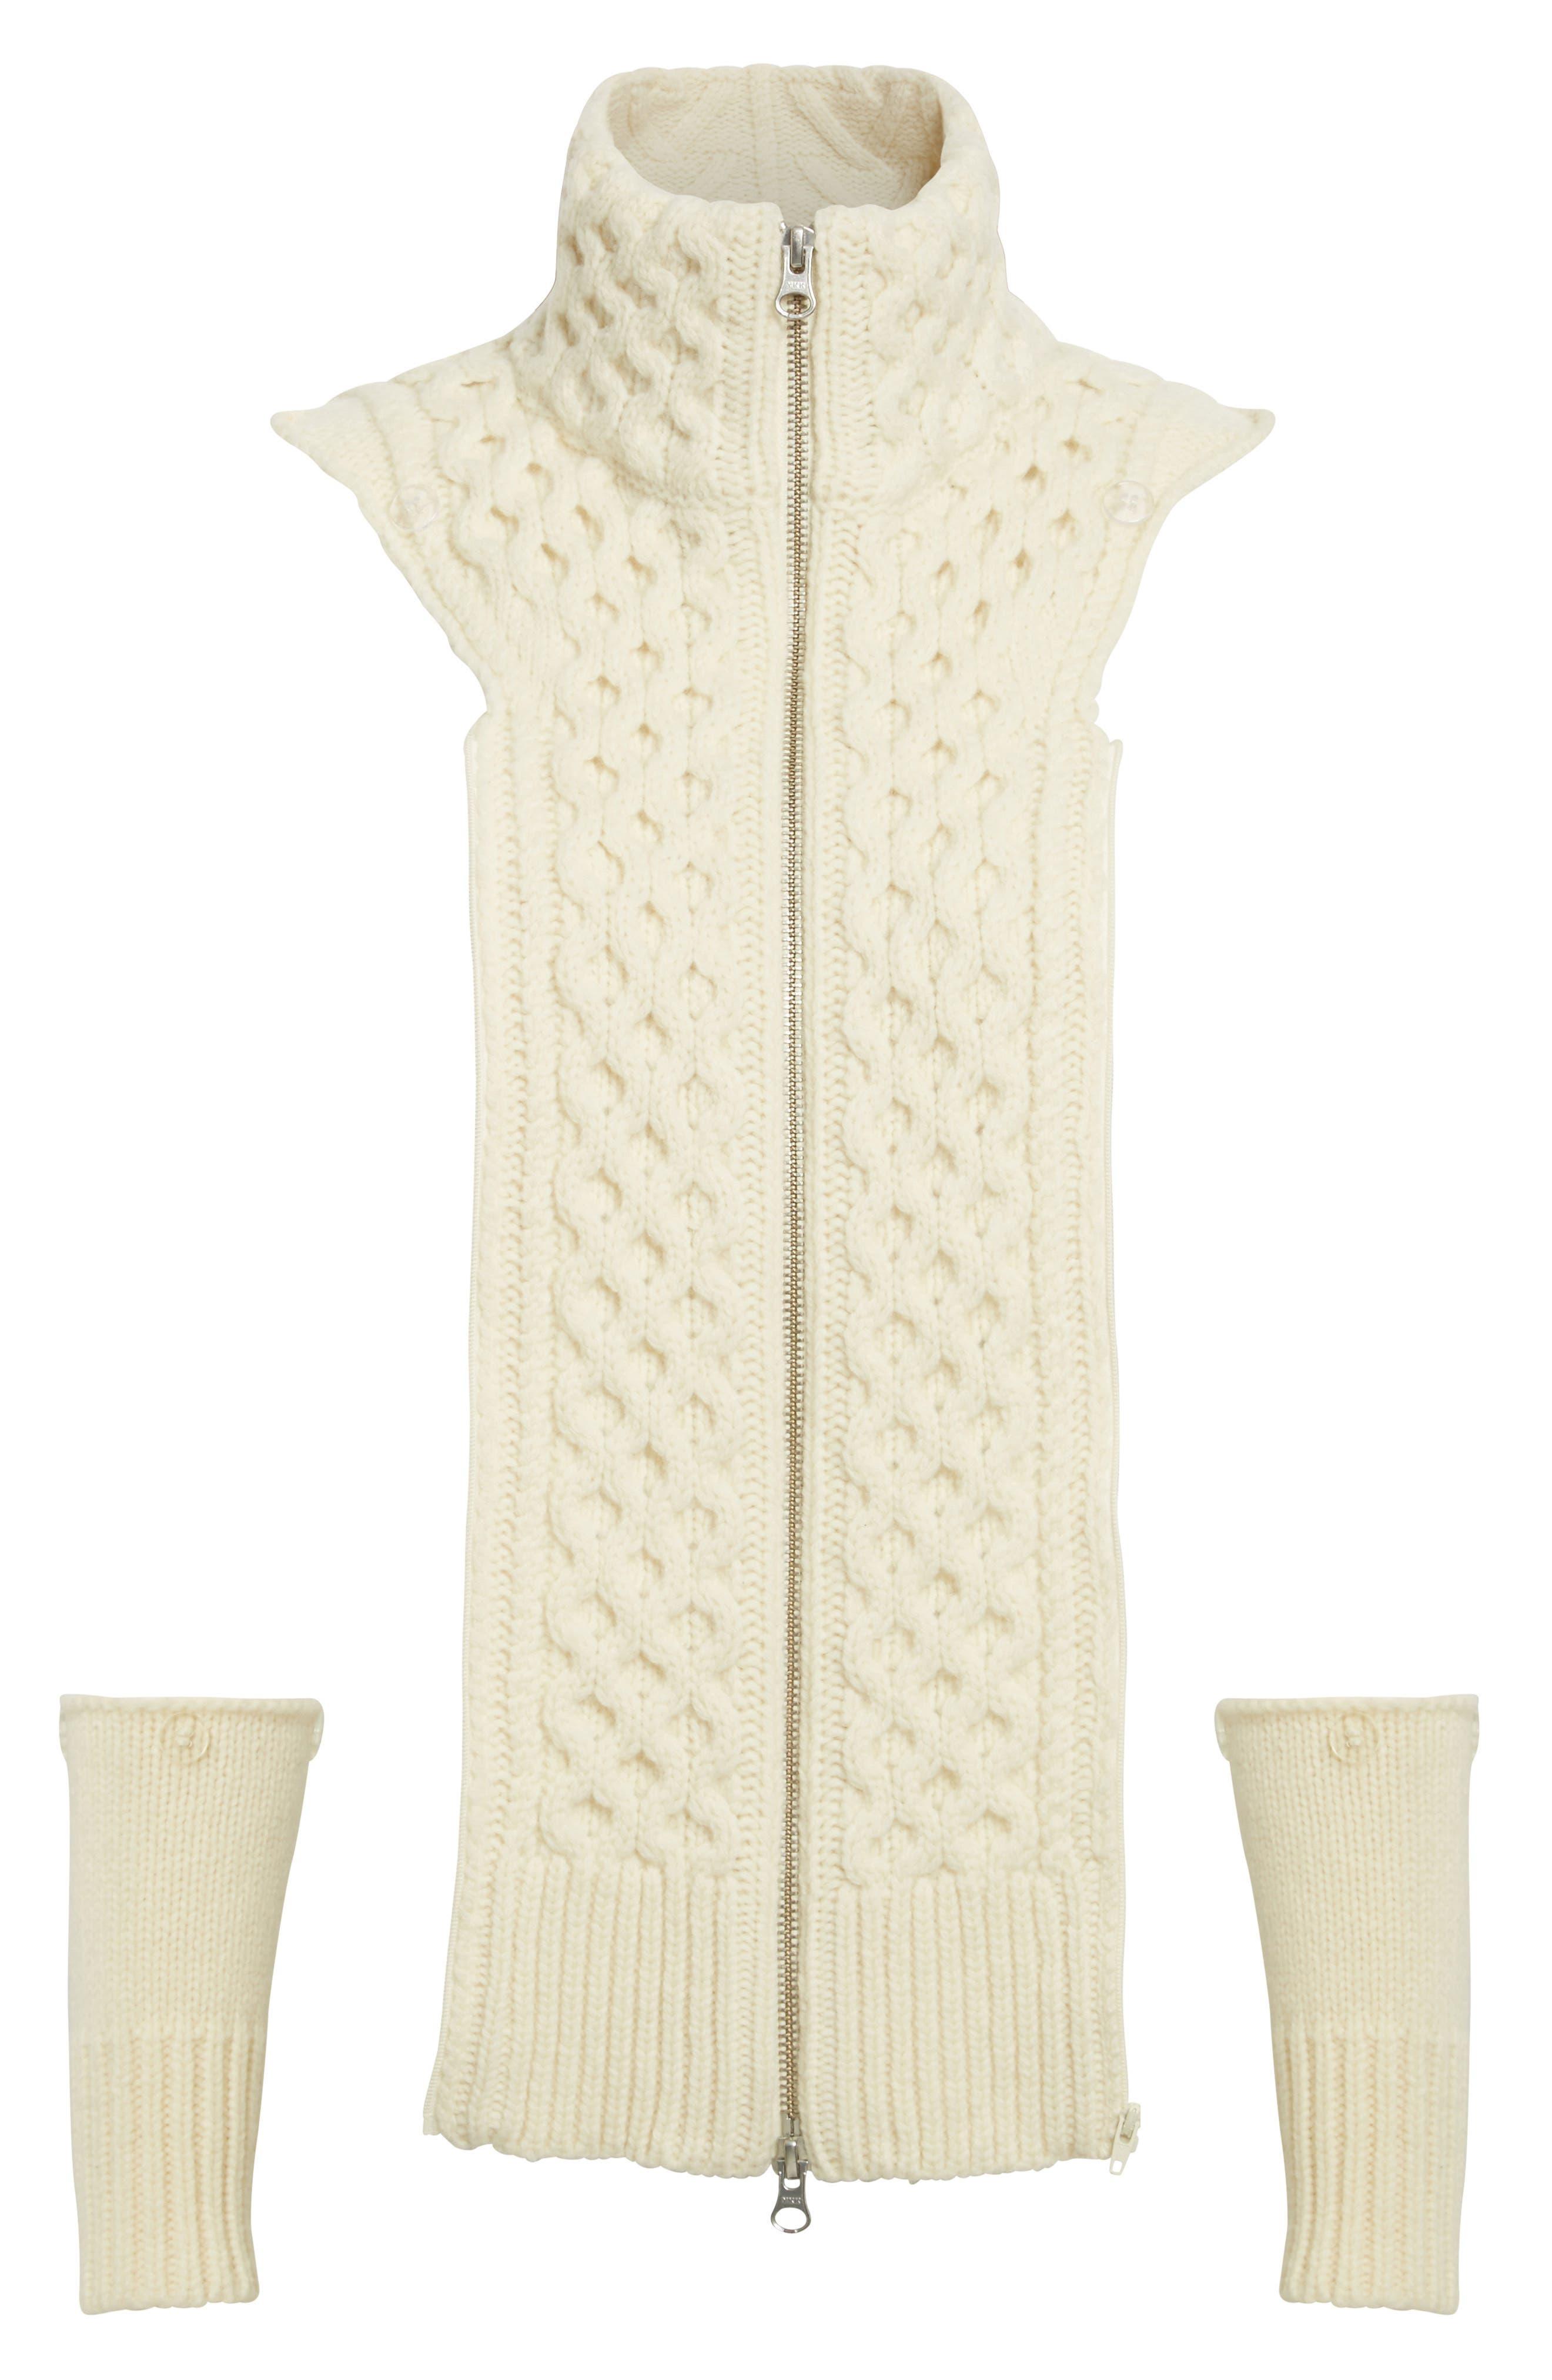 Alternate Image 1 Selected - Veronica Beard 'Upstate' Wool Dickey